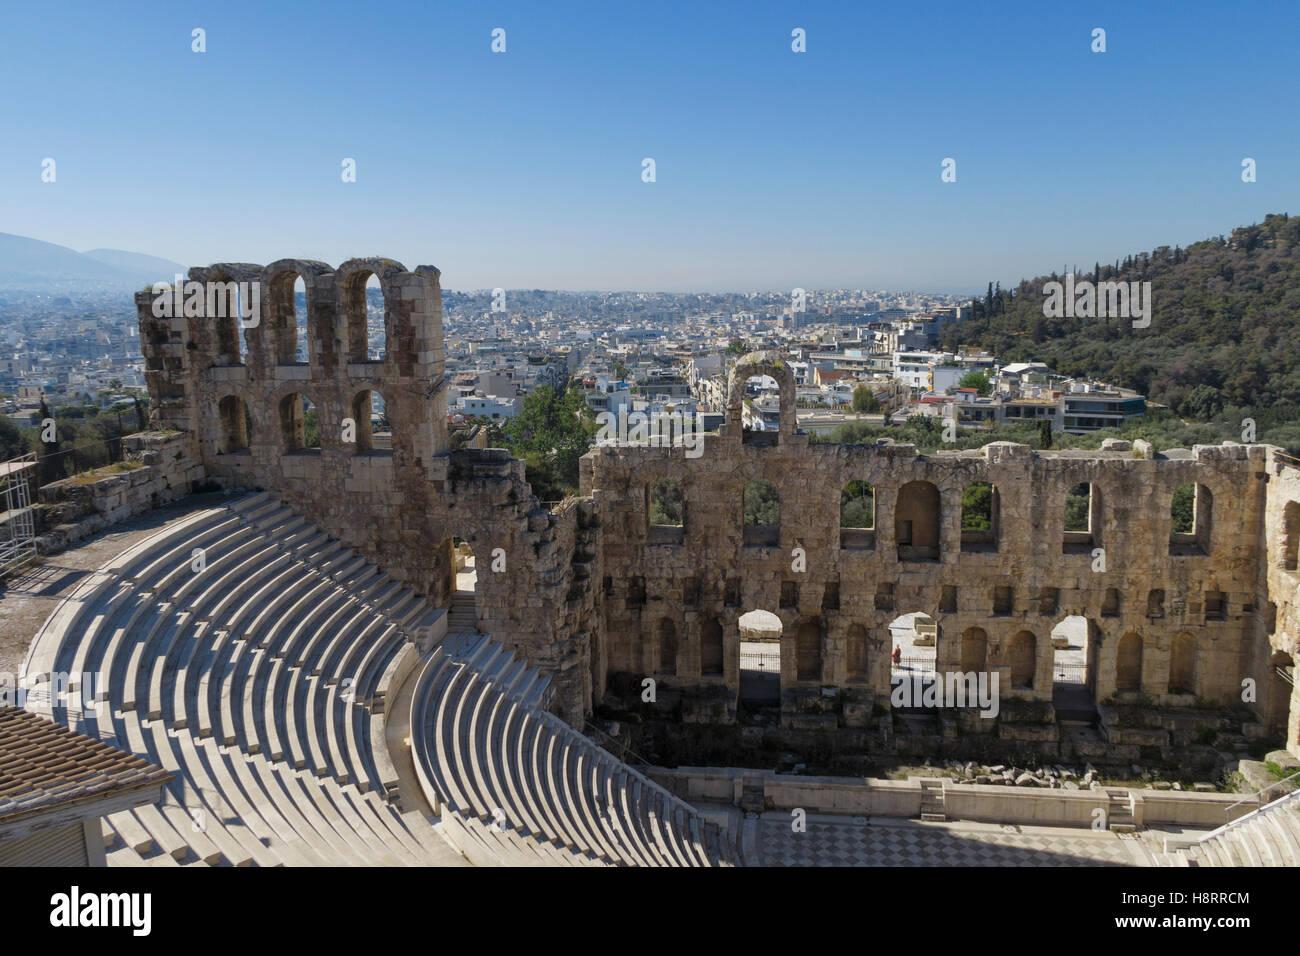 Odéon d'Hérode Atticus, Acropole, Athènes, Grèce Photo Stock